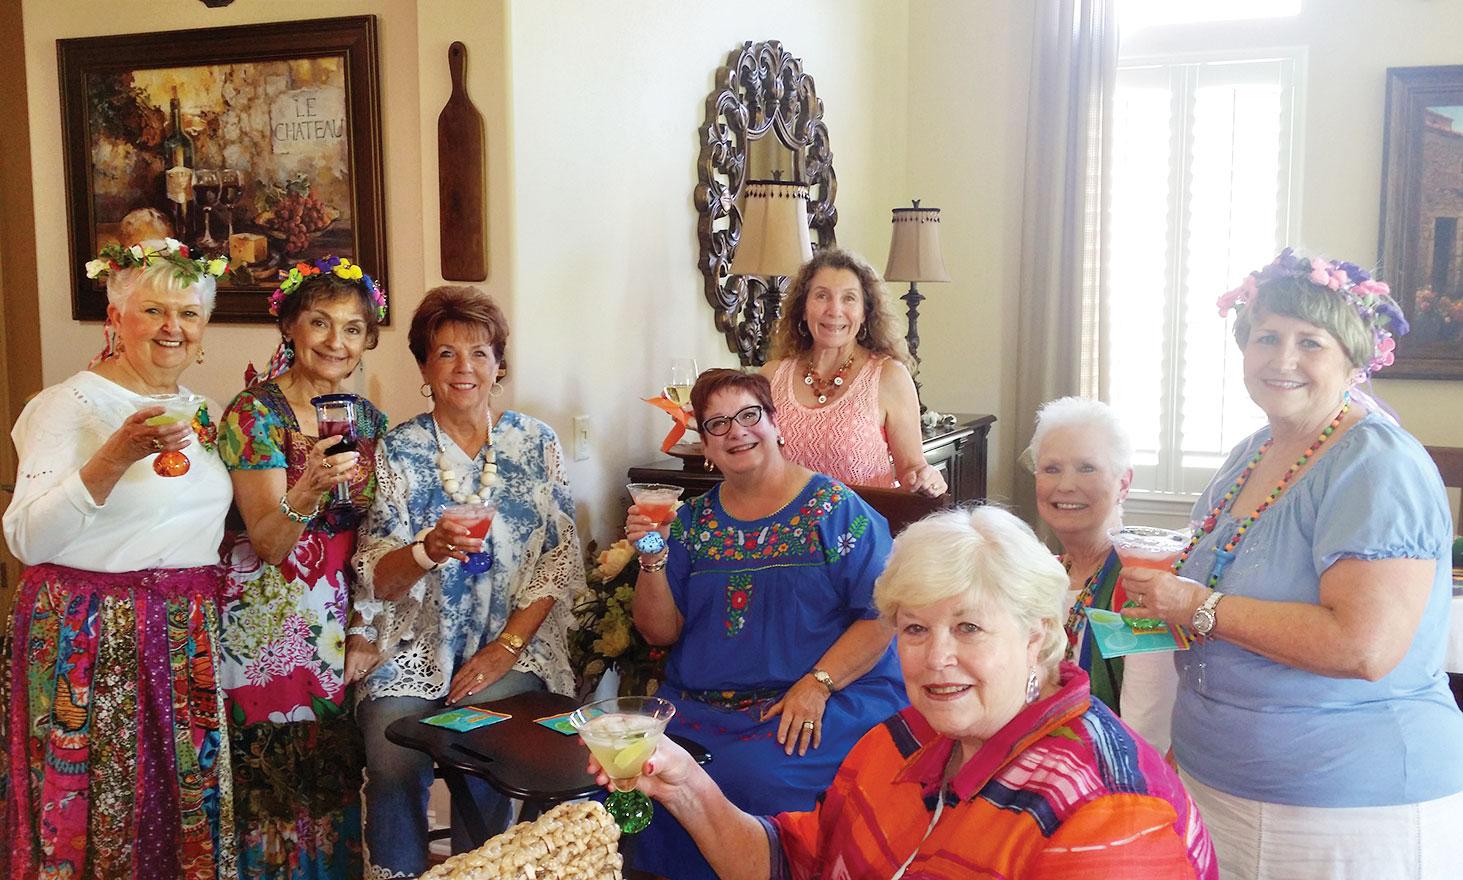 Colorful attire was worn by the LOLs: Sally Baggott, Peggy Crandall, Mary Ann Carroll, Gayle Coe, Judy Ondina, Glenda Brown, Carol Cieslik and Joan Krause.